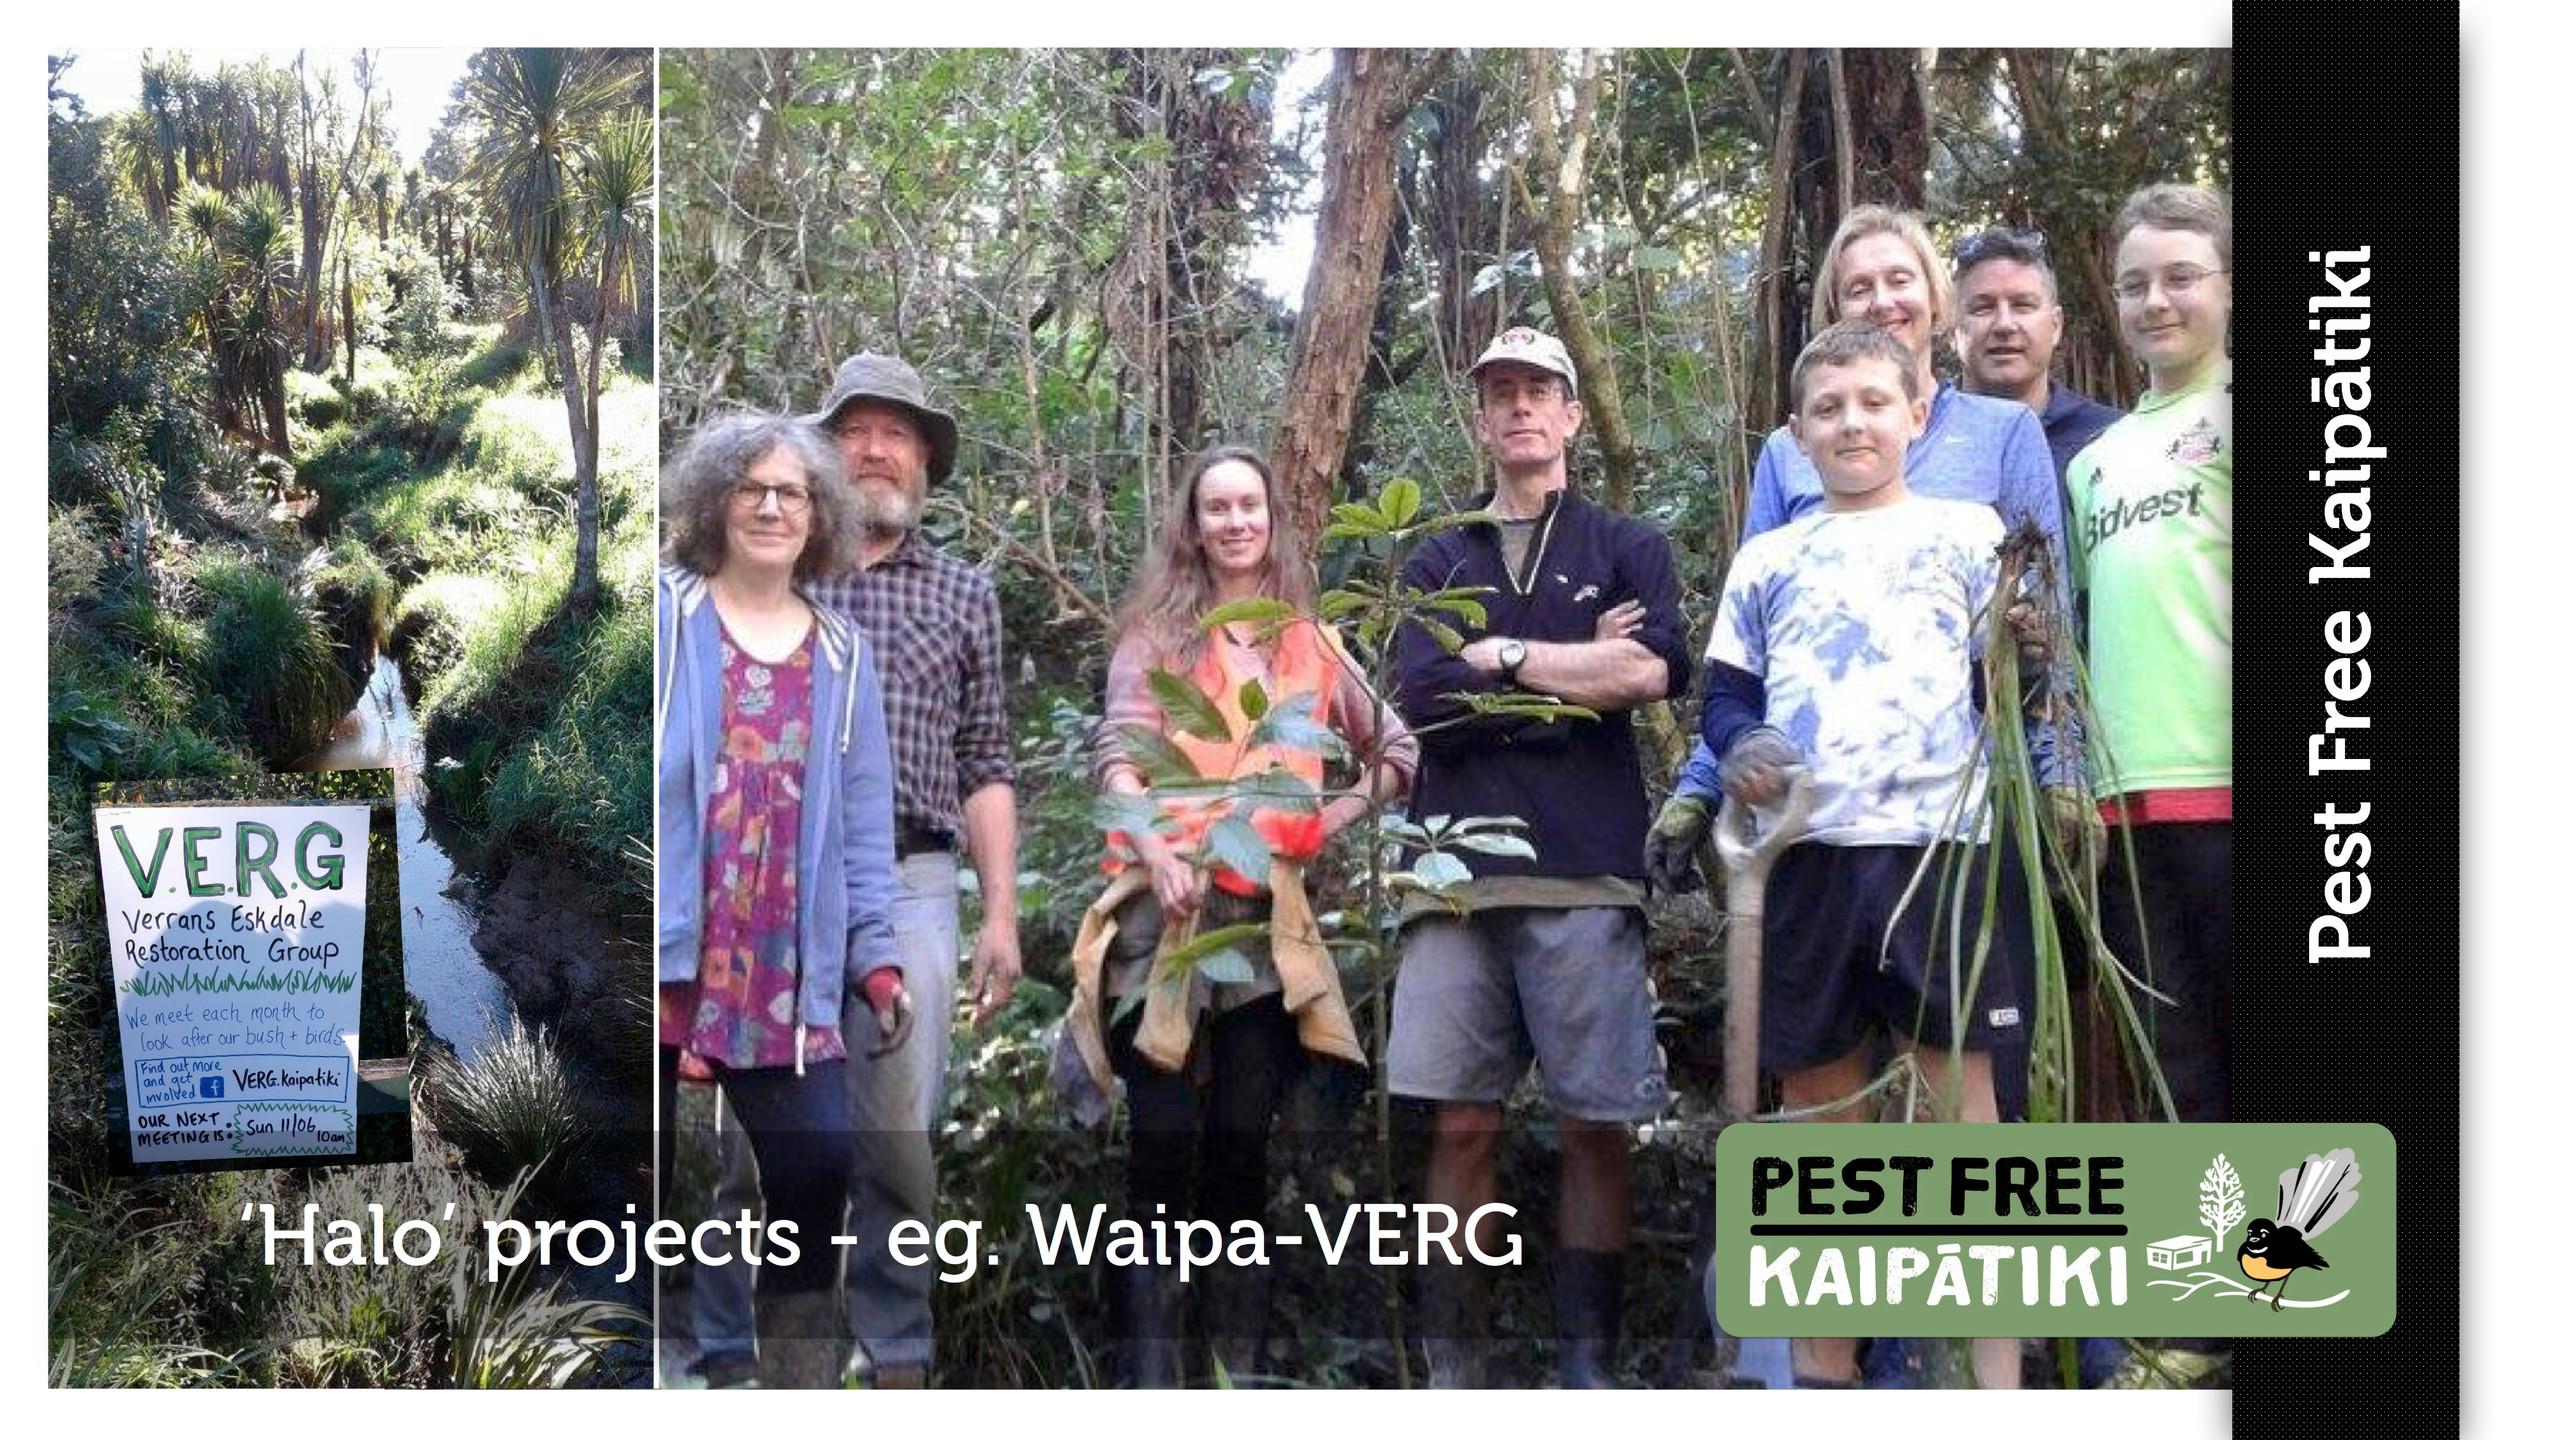 Pest Free Kaipatiki-Pestival-slide15